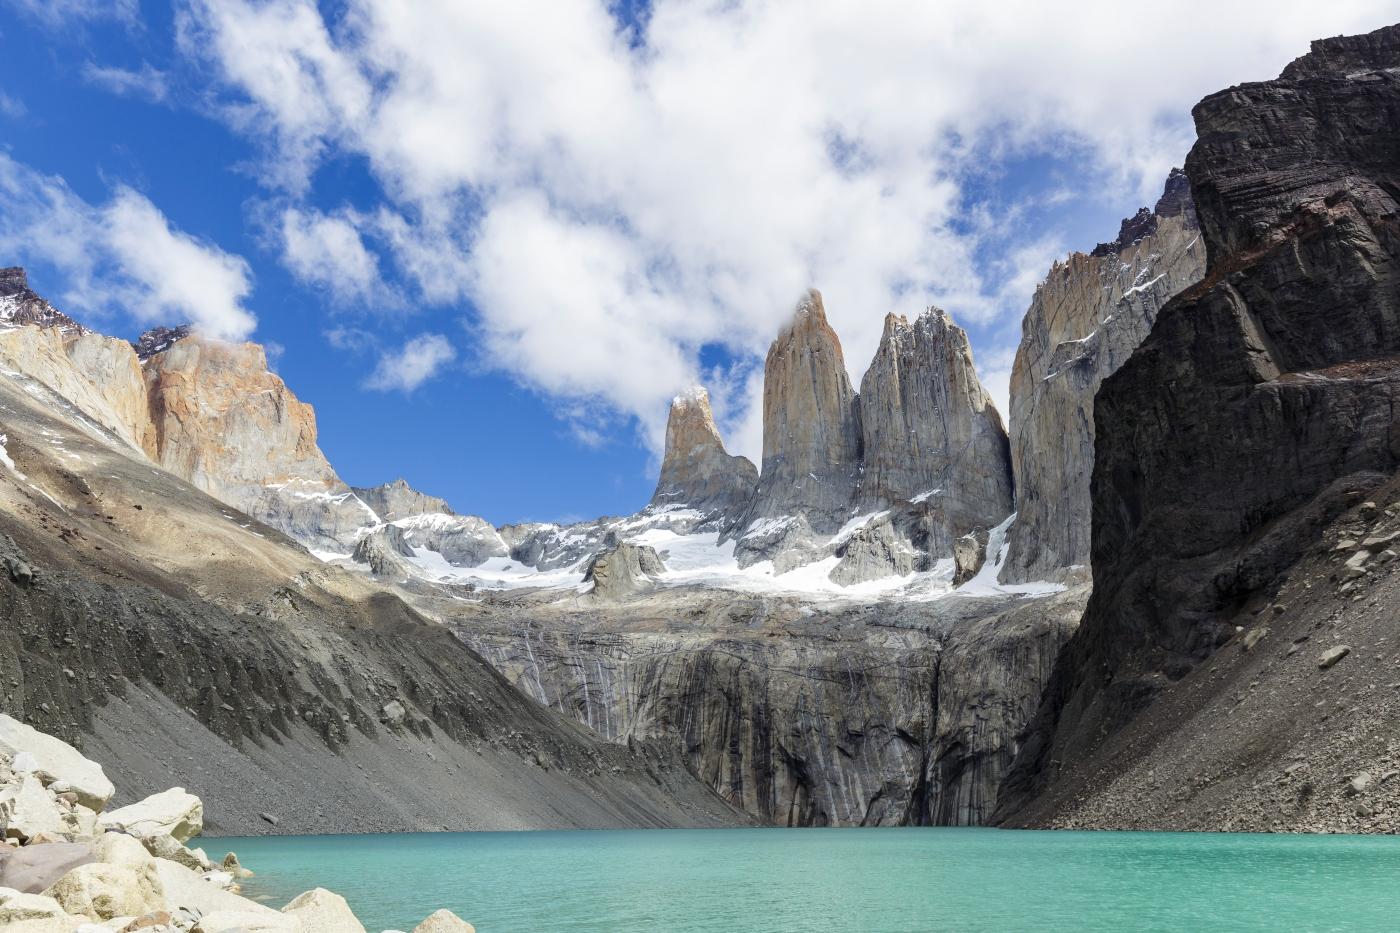 Imagen del Parque Nacional Torres del Paine